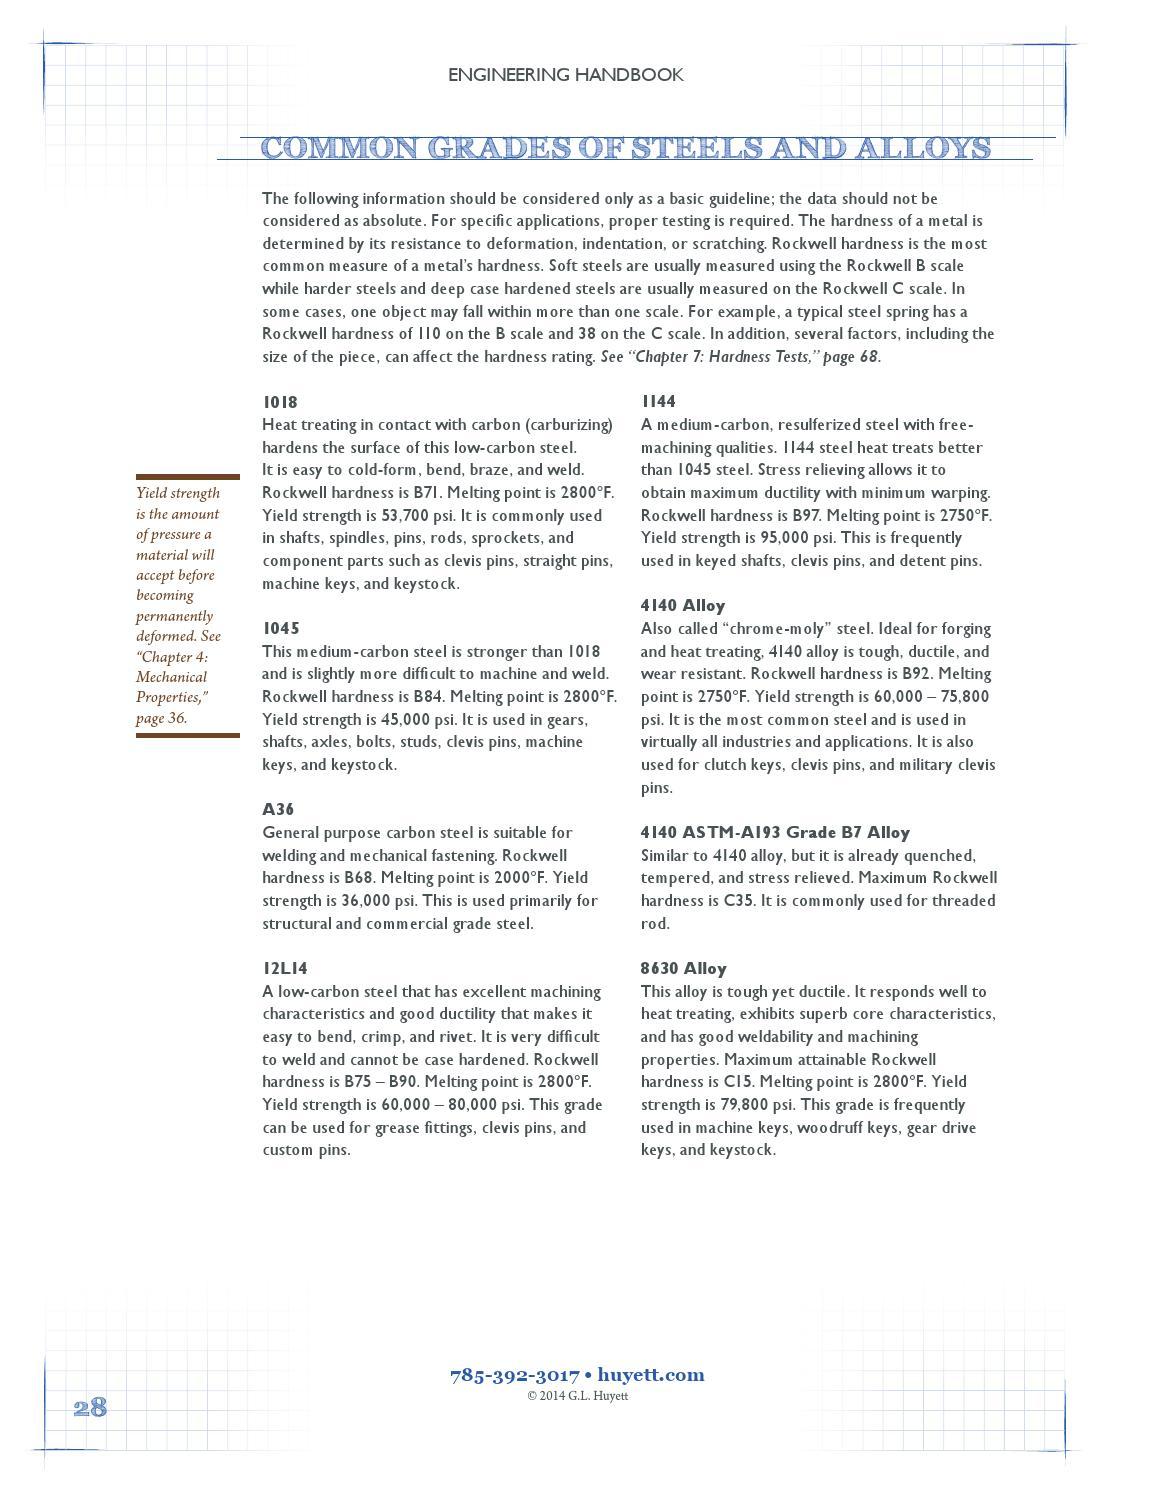 G L  Huyett Engineering Handbook by G L  Huyett - issuu